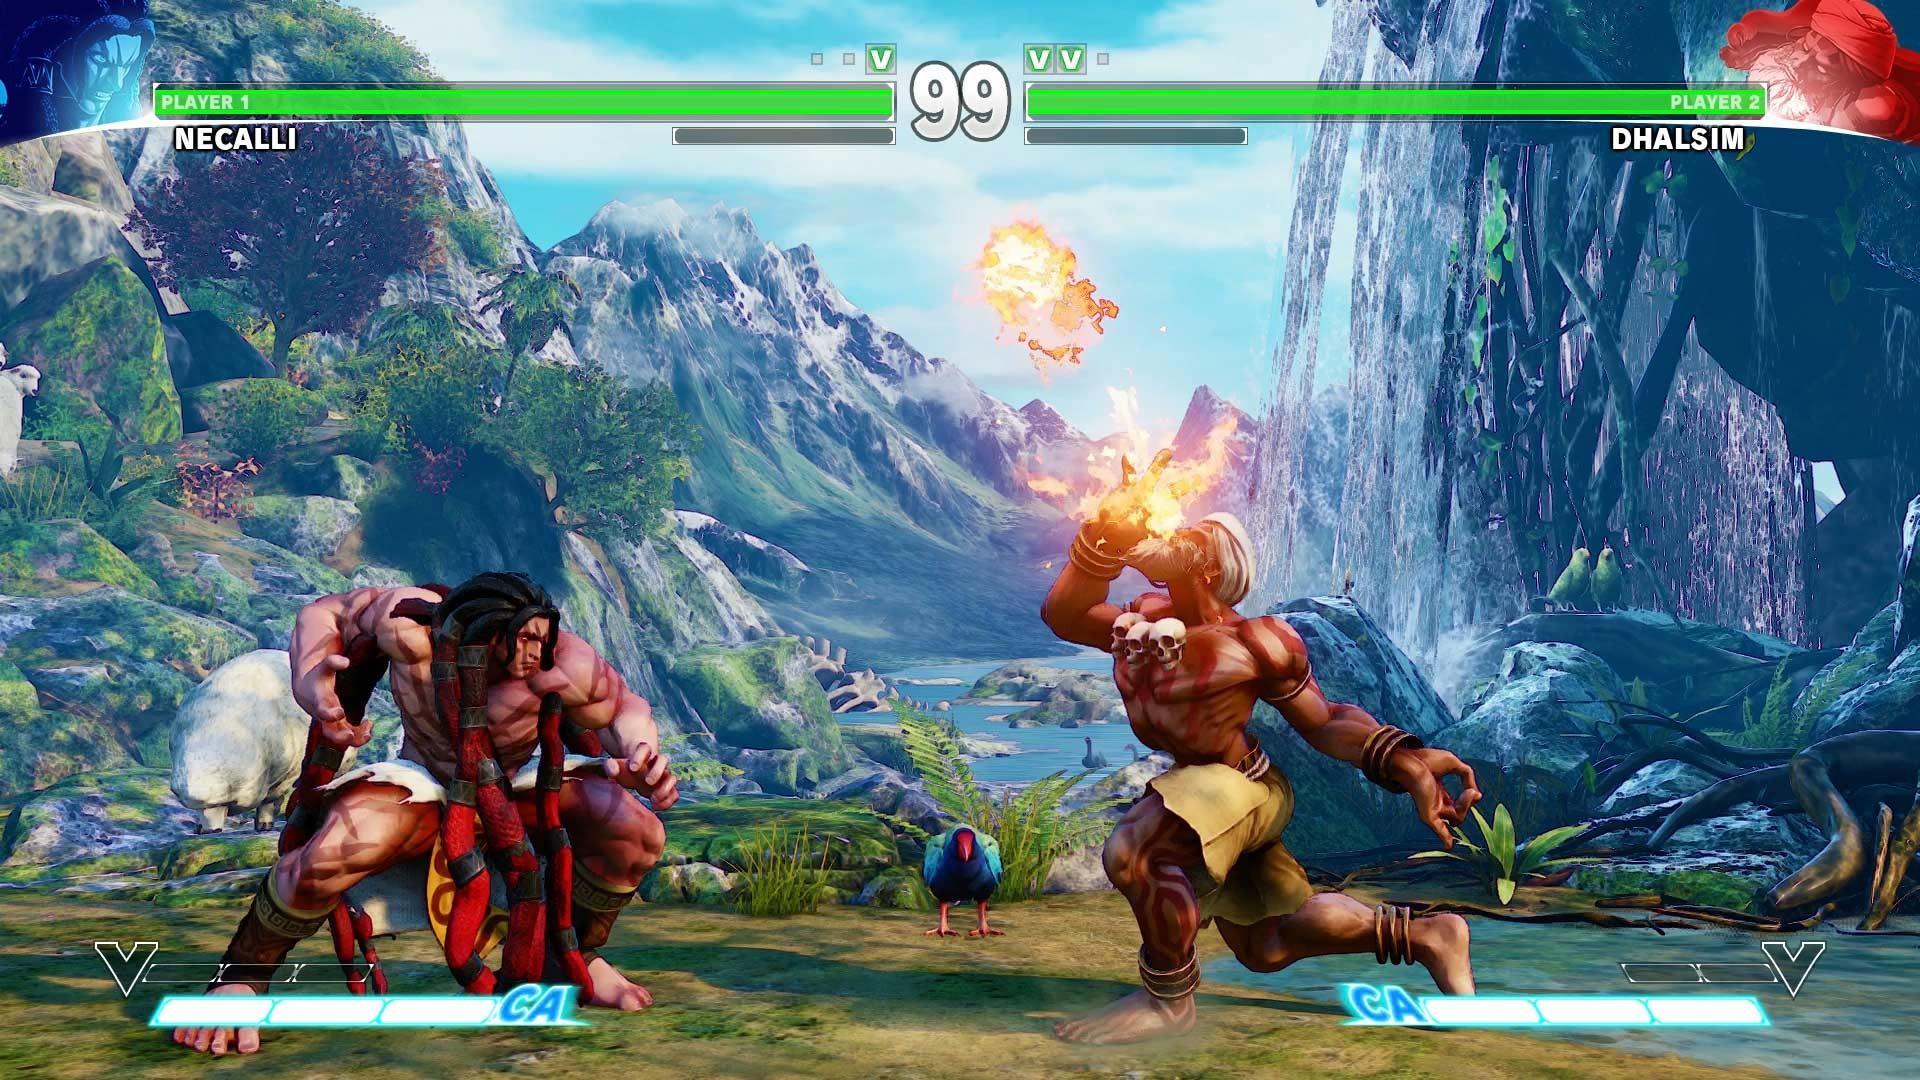 Street Fighter 2 Wallpaper (72+ images)